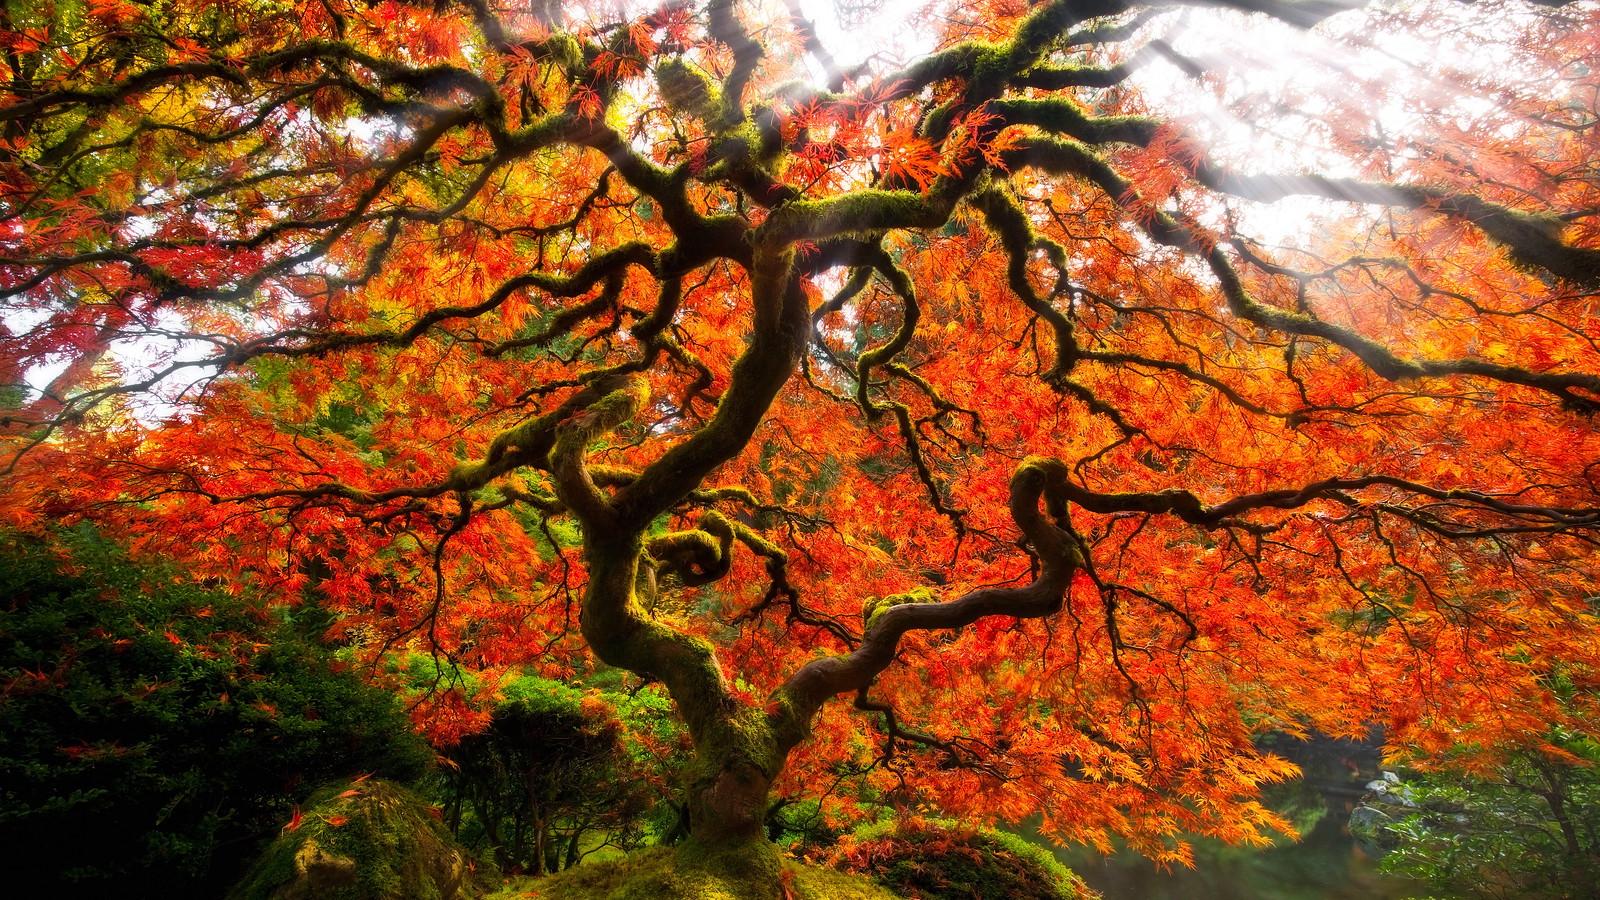 The Serpent Tree